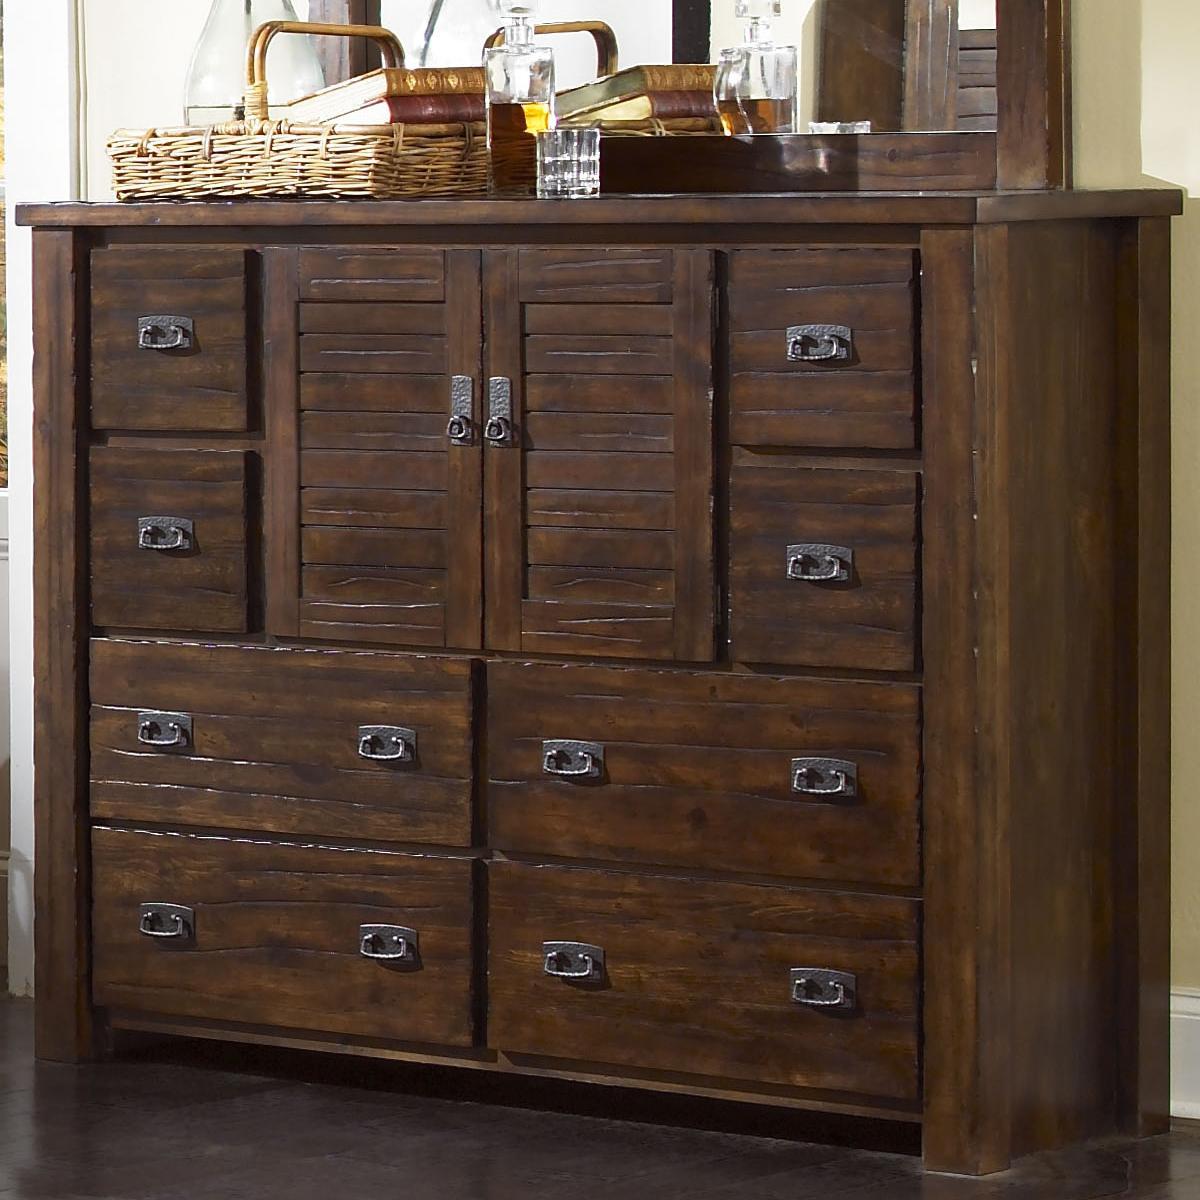 Progressive Furniture Trestlewood Dresser W/ 8 Drawers